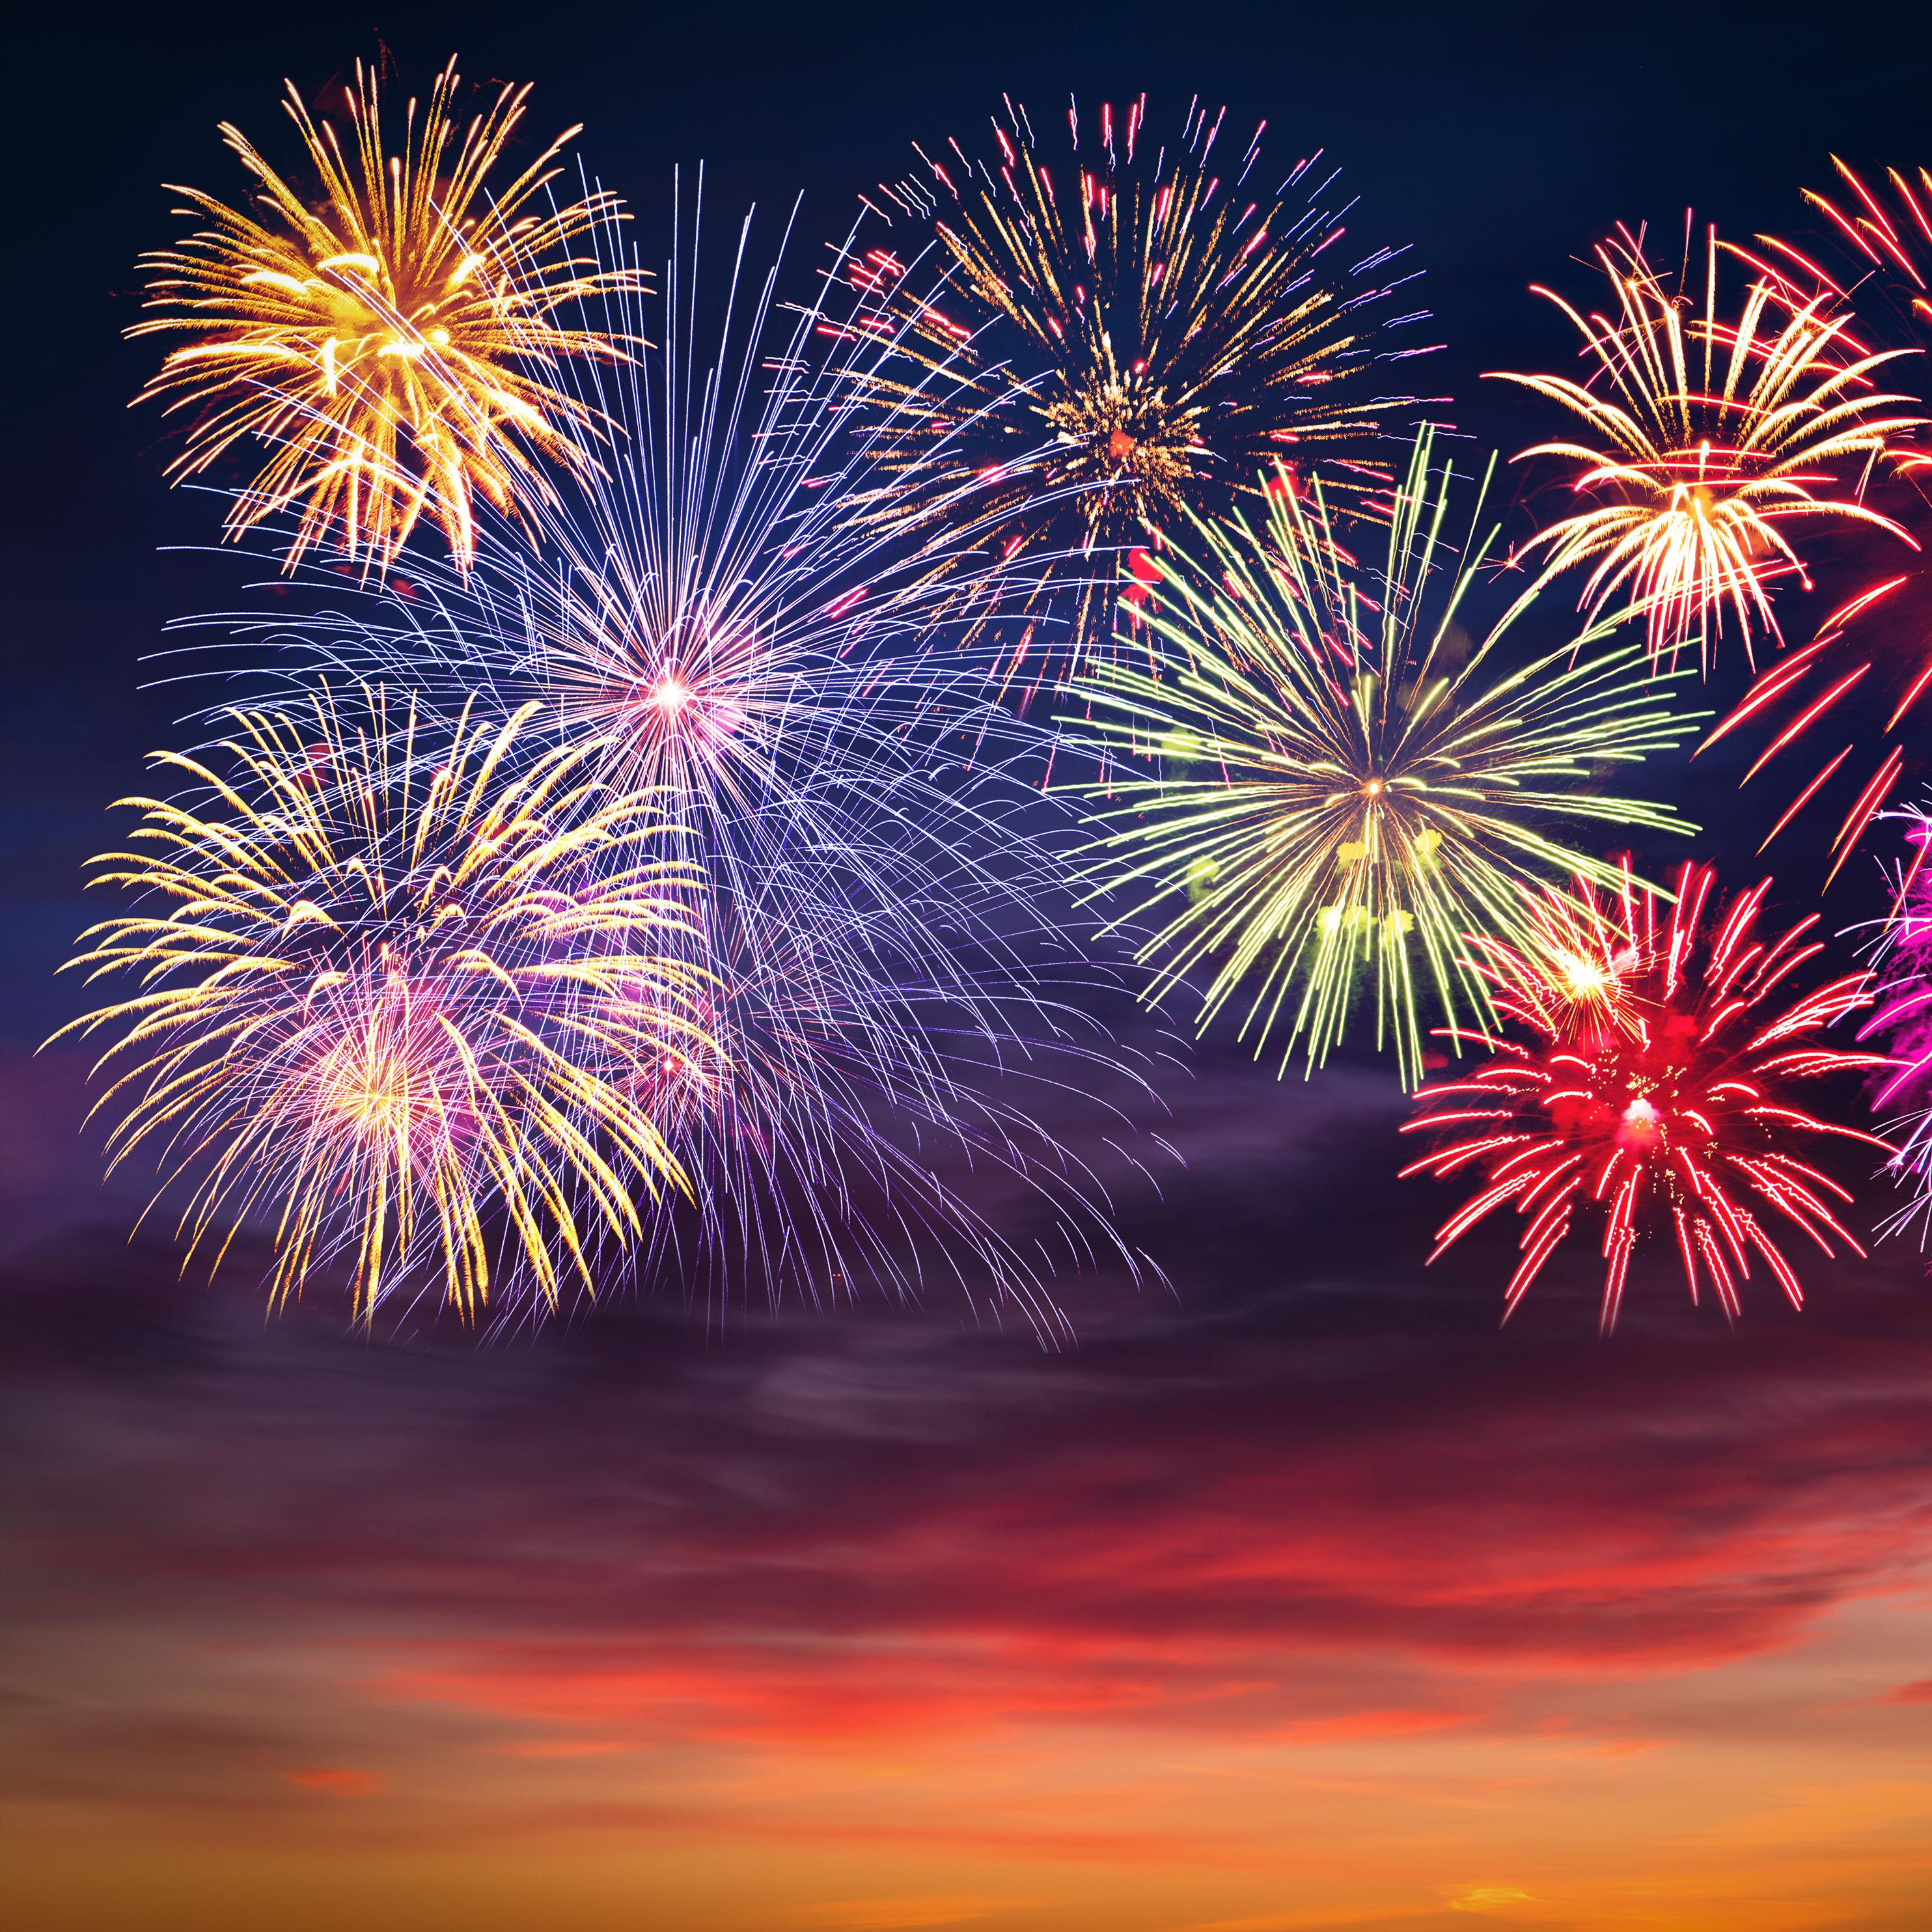 Fireworks kkjbrg